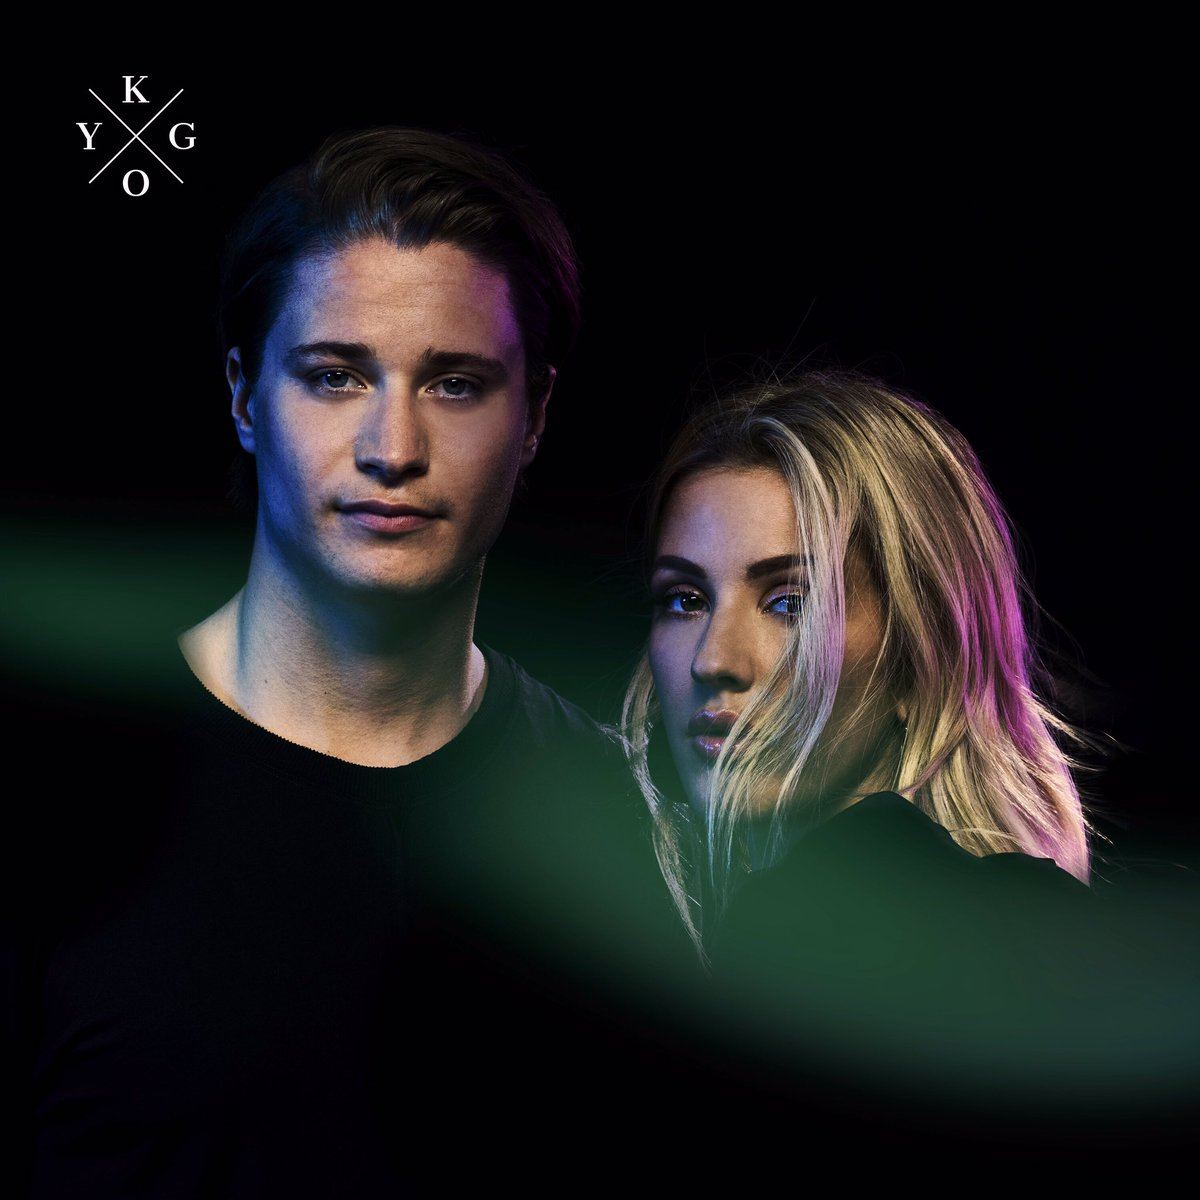 Ellie Goulding and Kygo Release